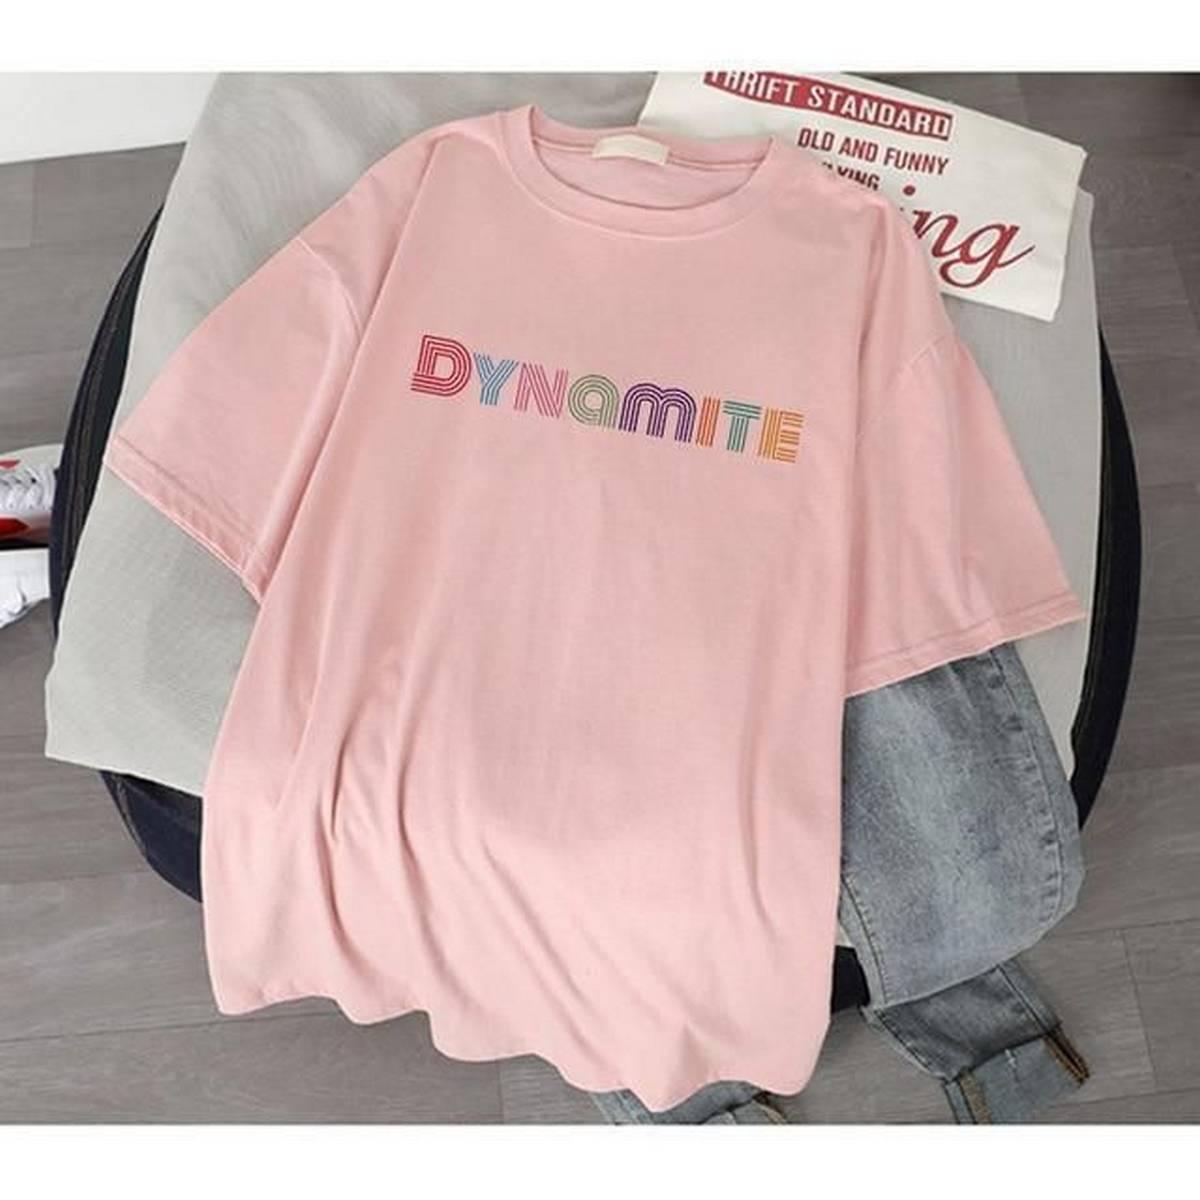 Bts Fan Merch Cotton Half Sleeves O Neck T Shirt For Women